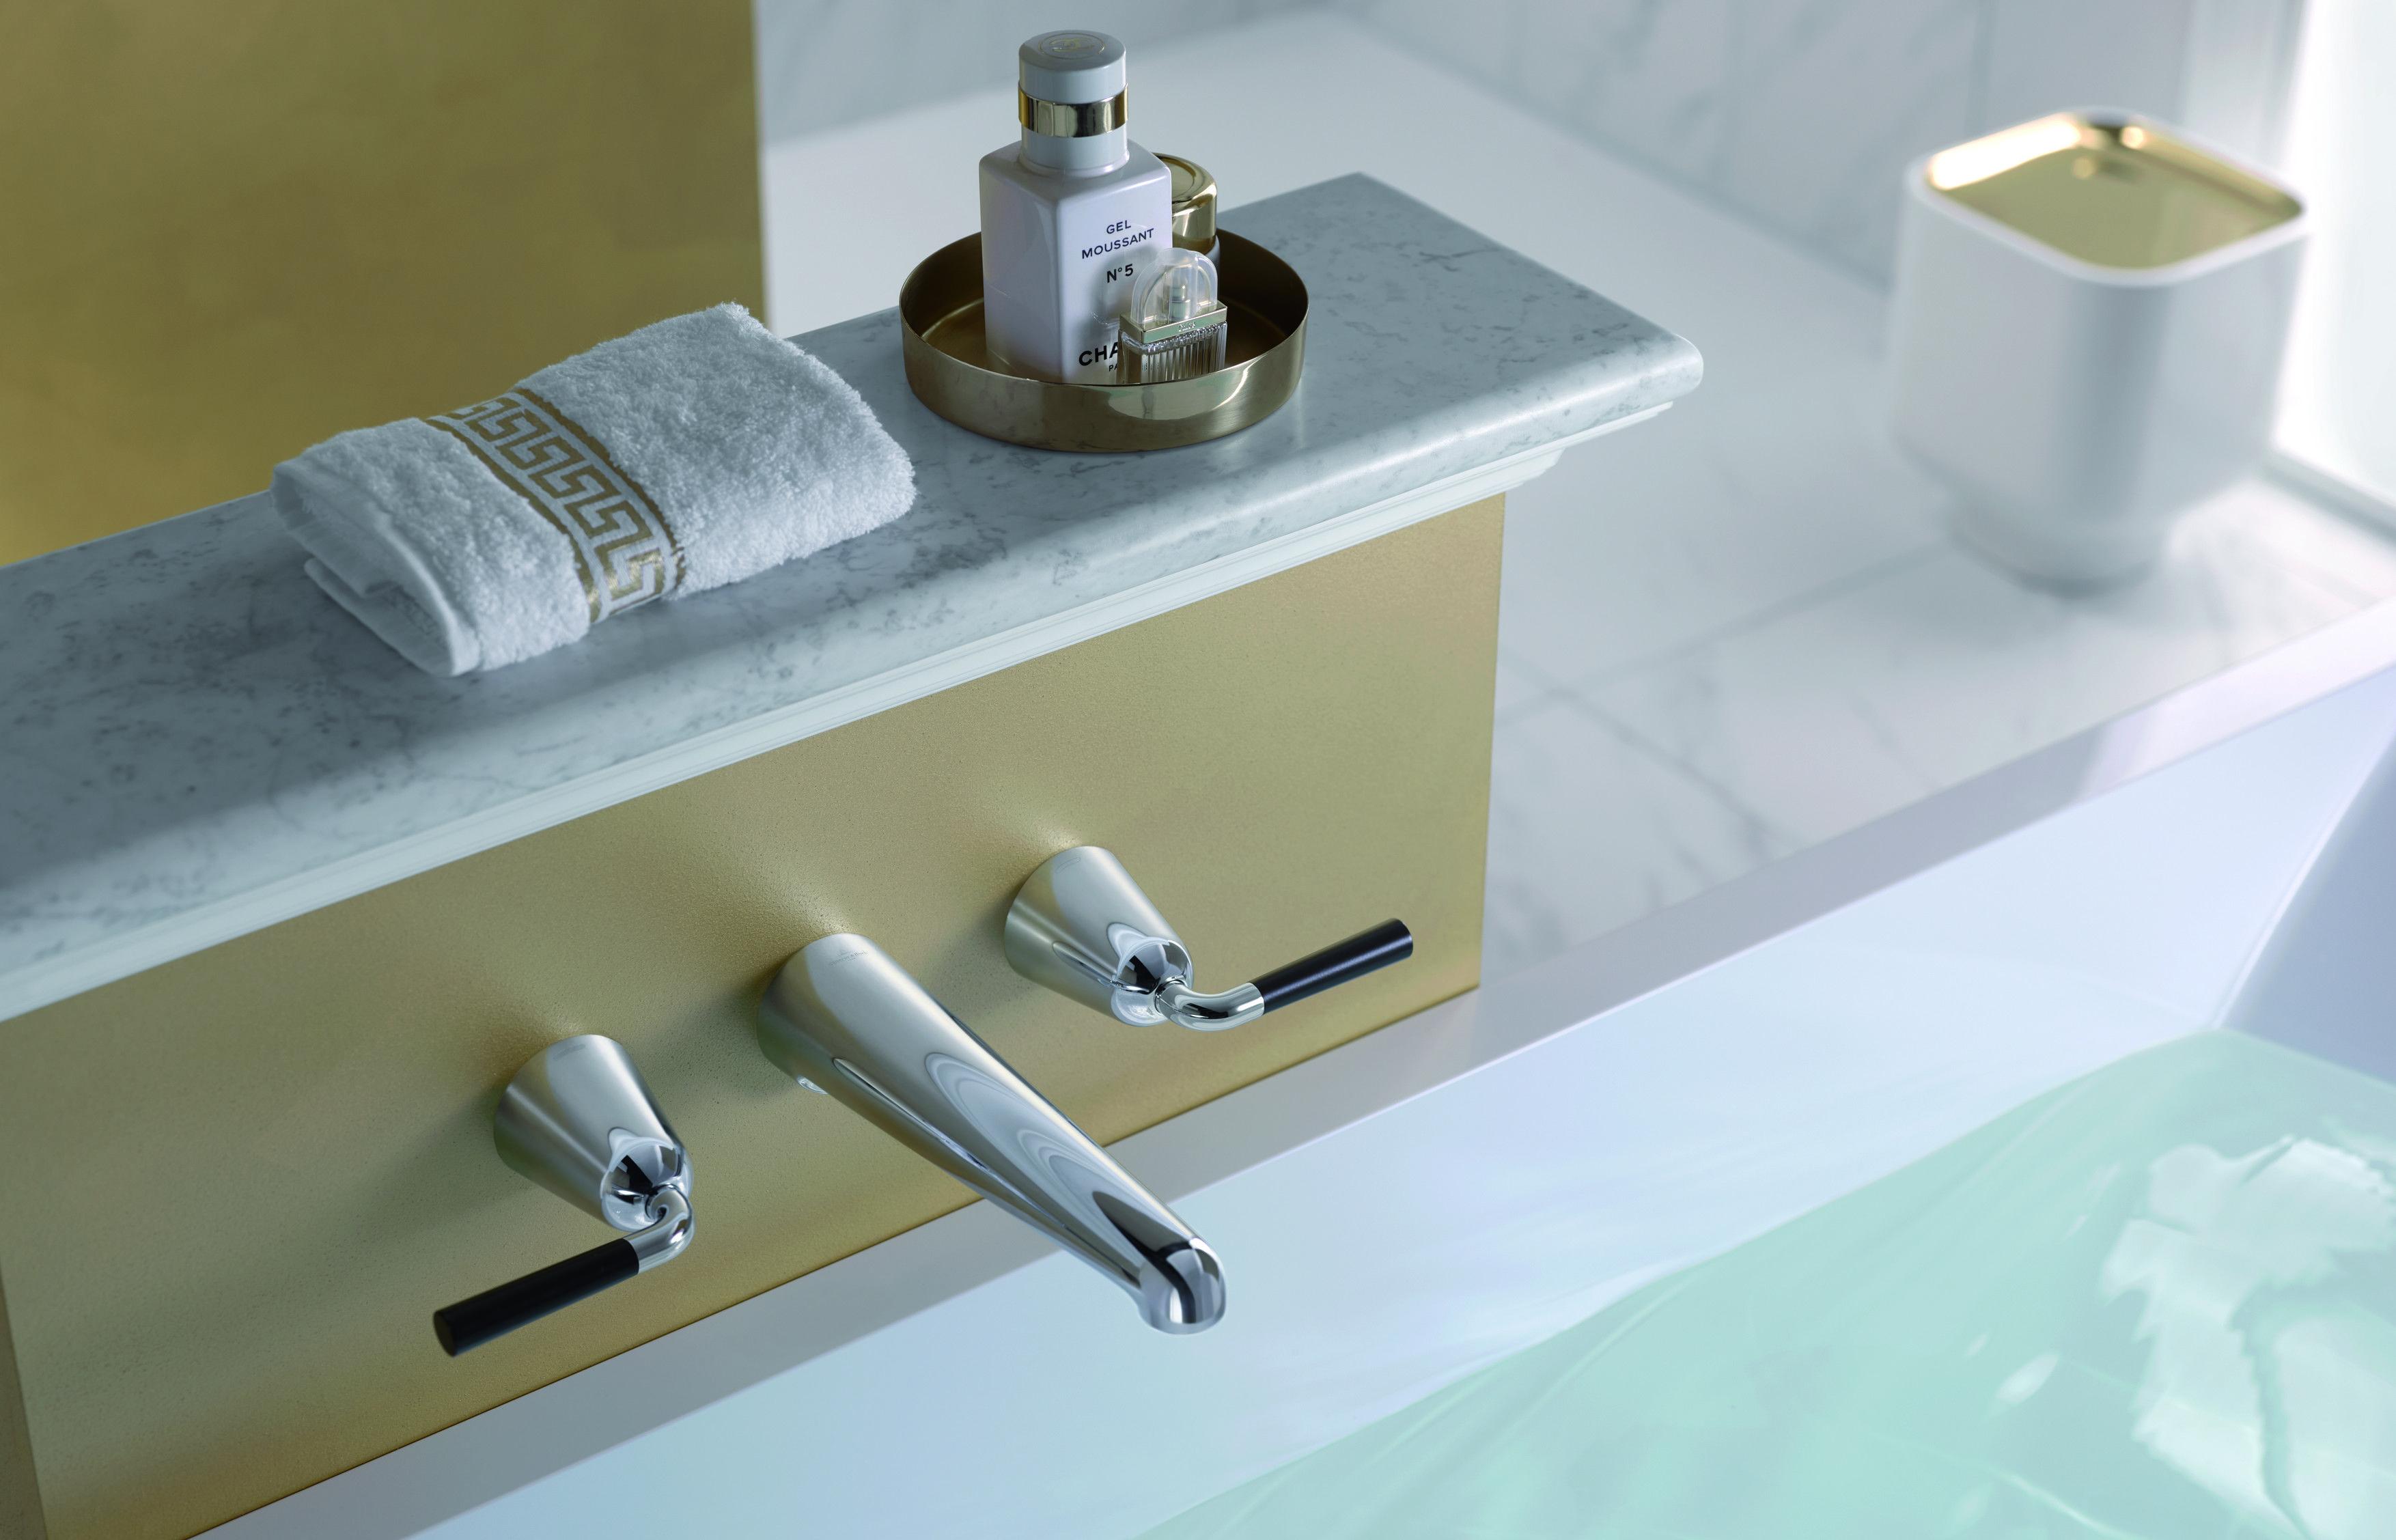 Dornbracht badkraan design badkamer sanidrome 1. badkraan